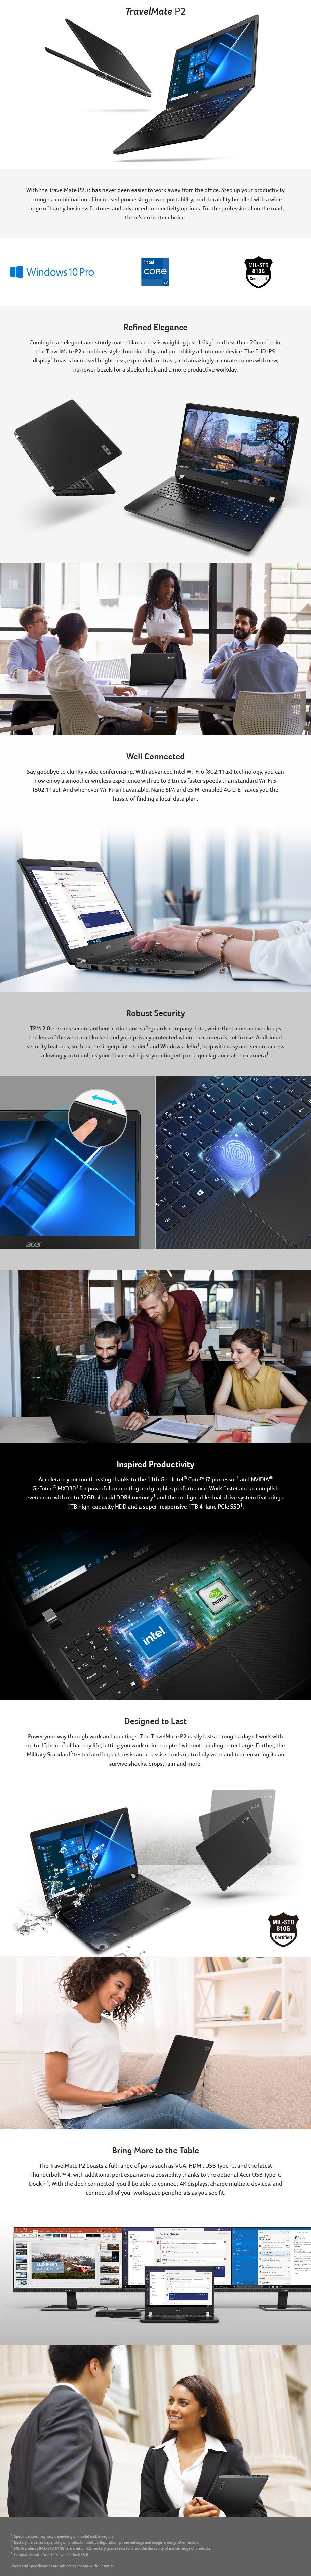 acer-travelmate-p214-14-laptop-i510210u-16gb-256gb-win10-pro-ac41265-8-3-.jpg